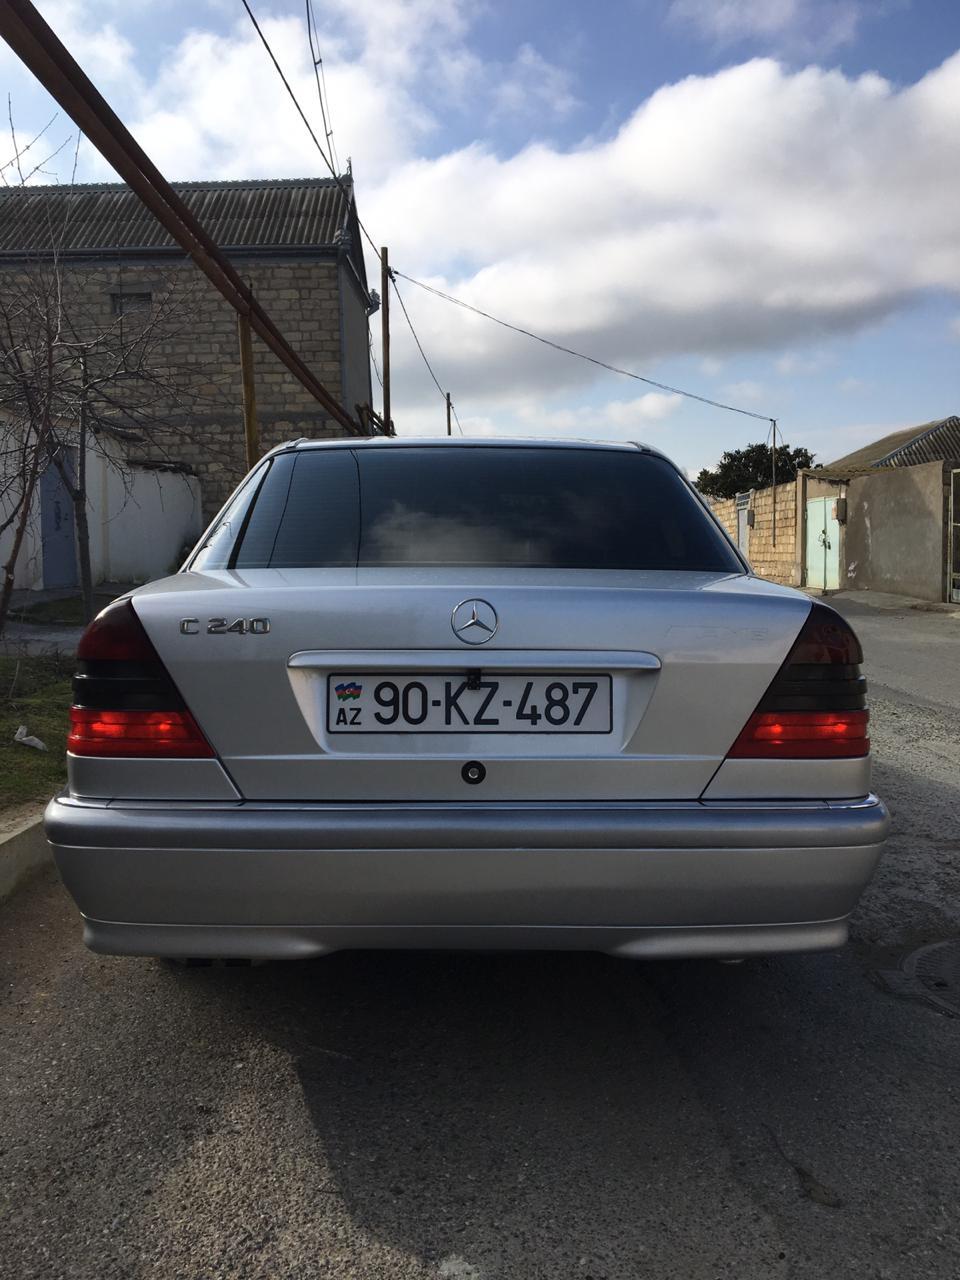 Mercedes-Benz C 240 2.4(lt) 1998 İkinci əl  $12300